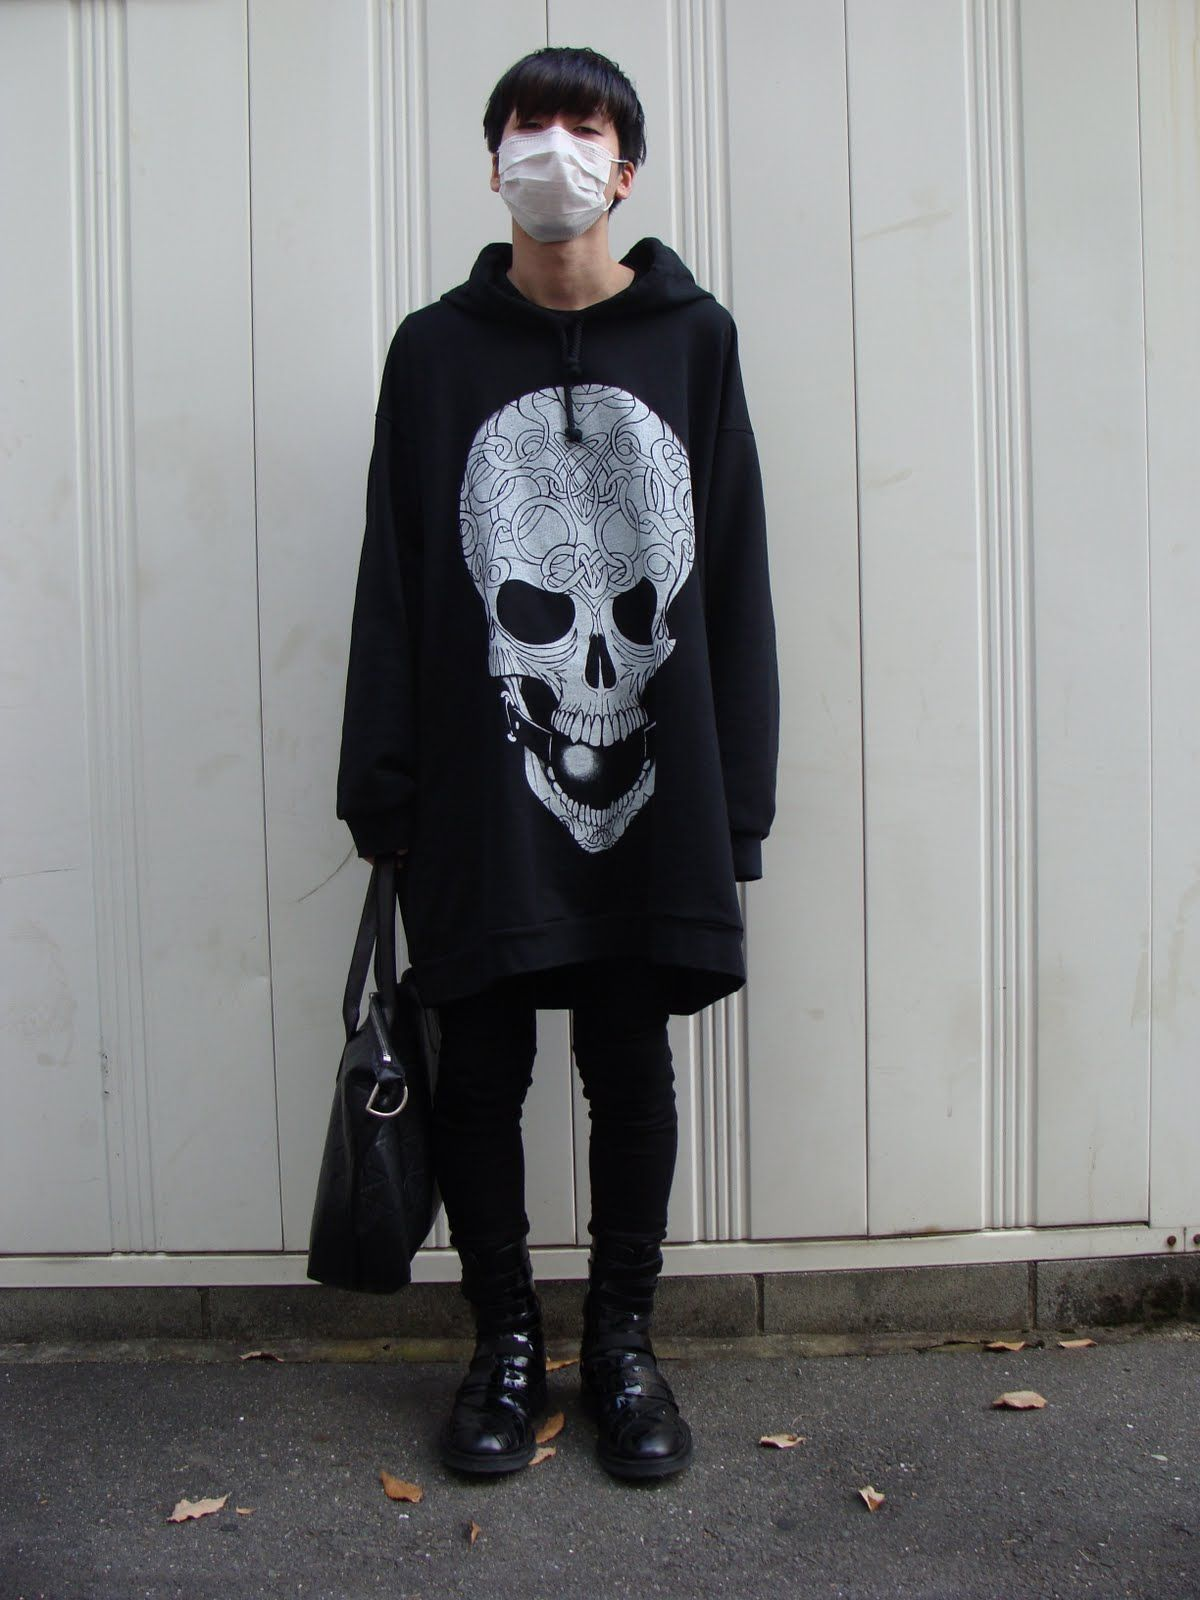 Badass Sweater Black Hair All Black Face Mask Korean Street Fashion Japanese Street Fashion Korean Fashion